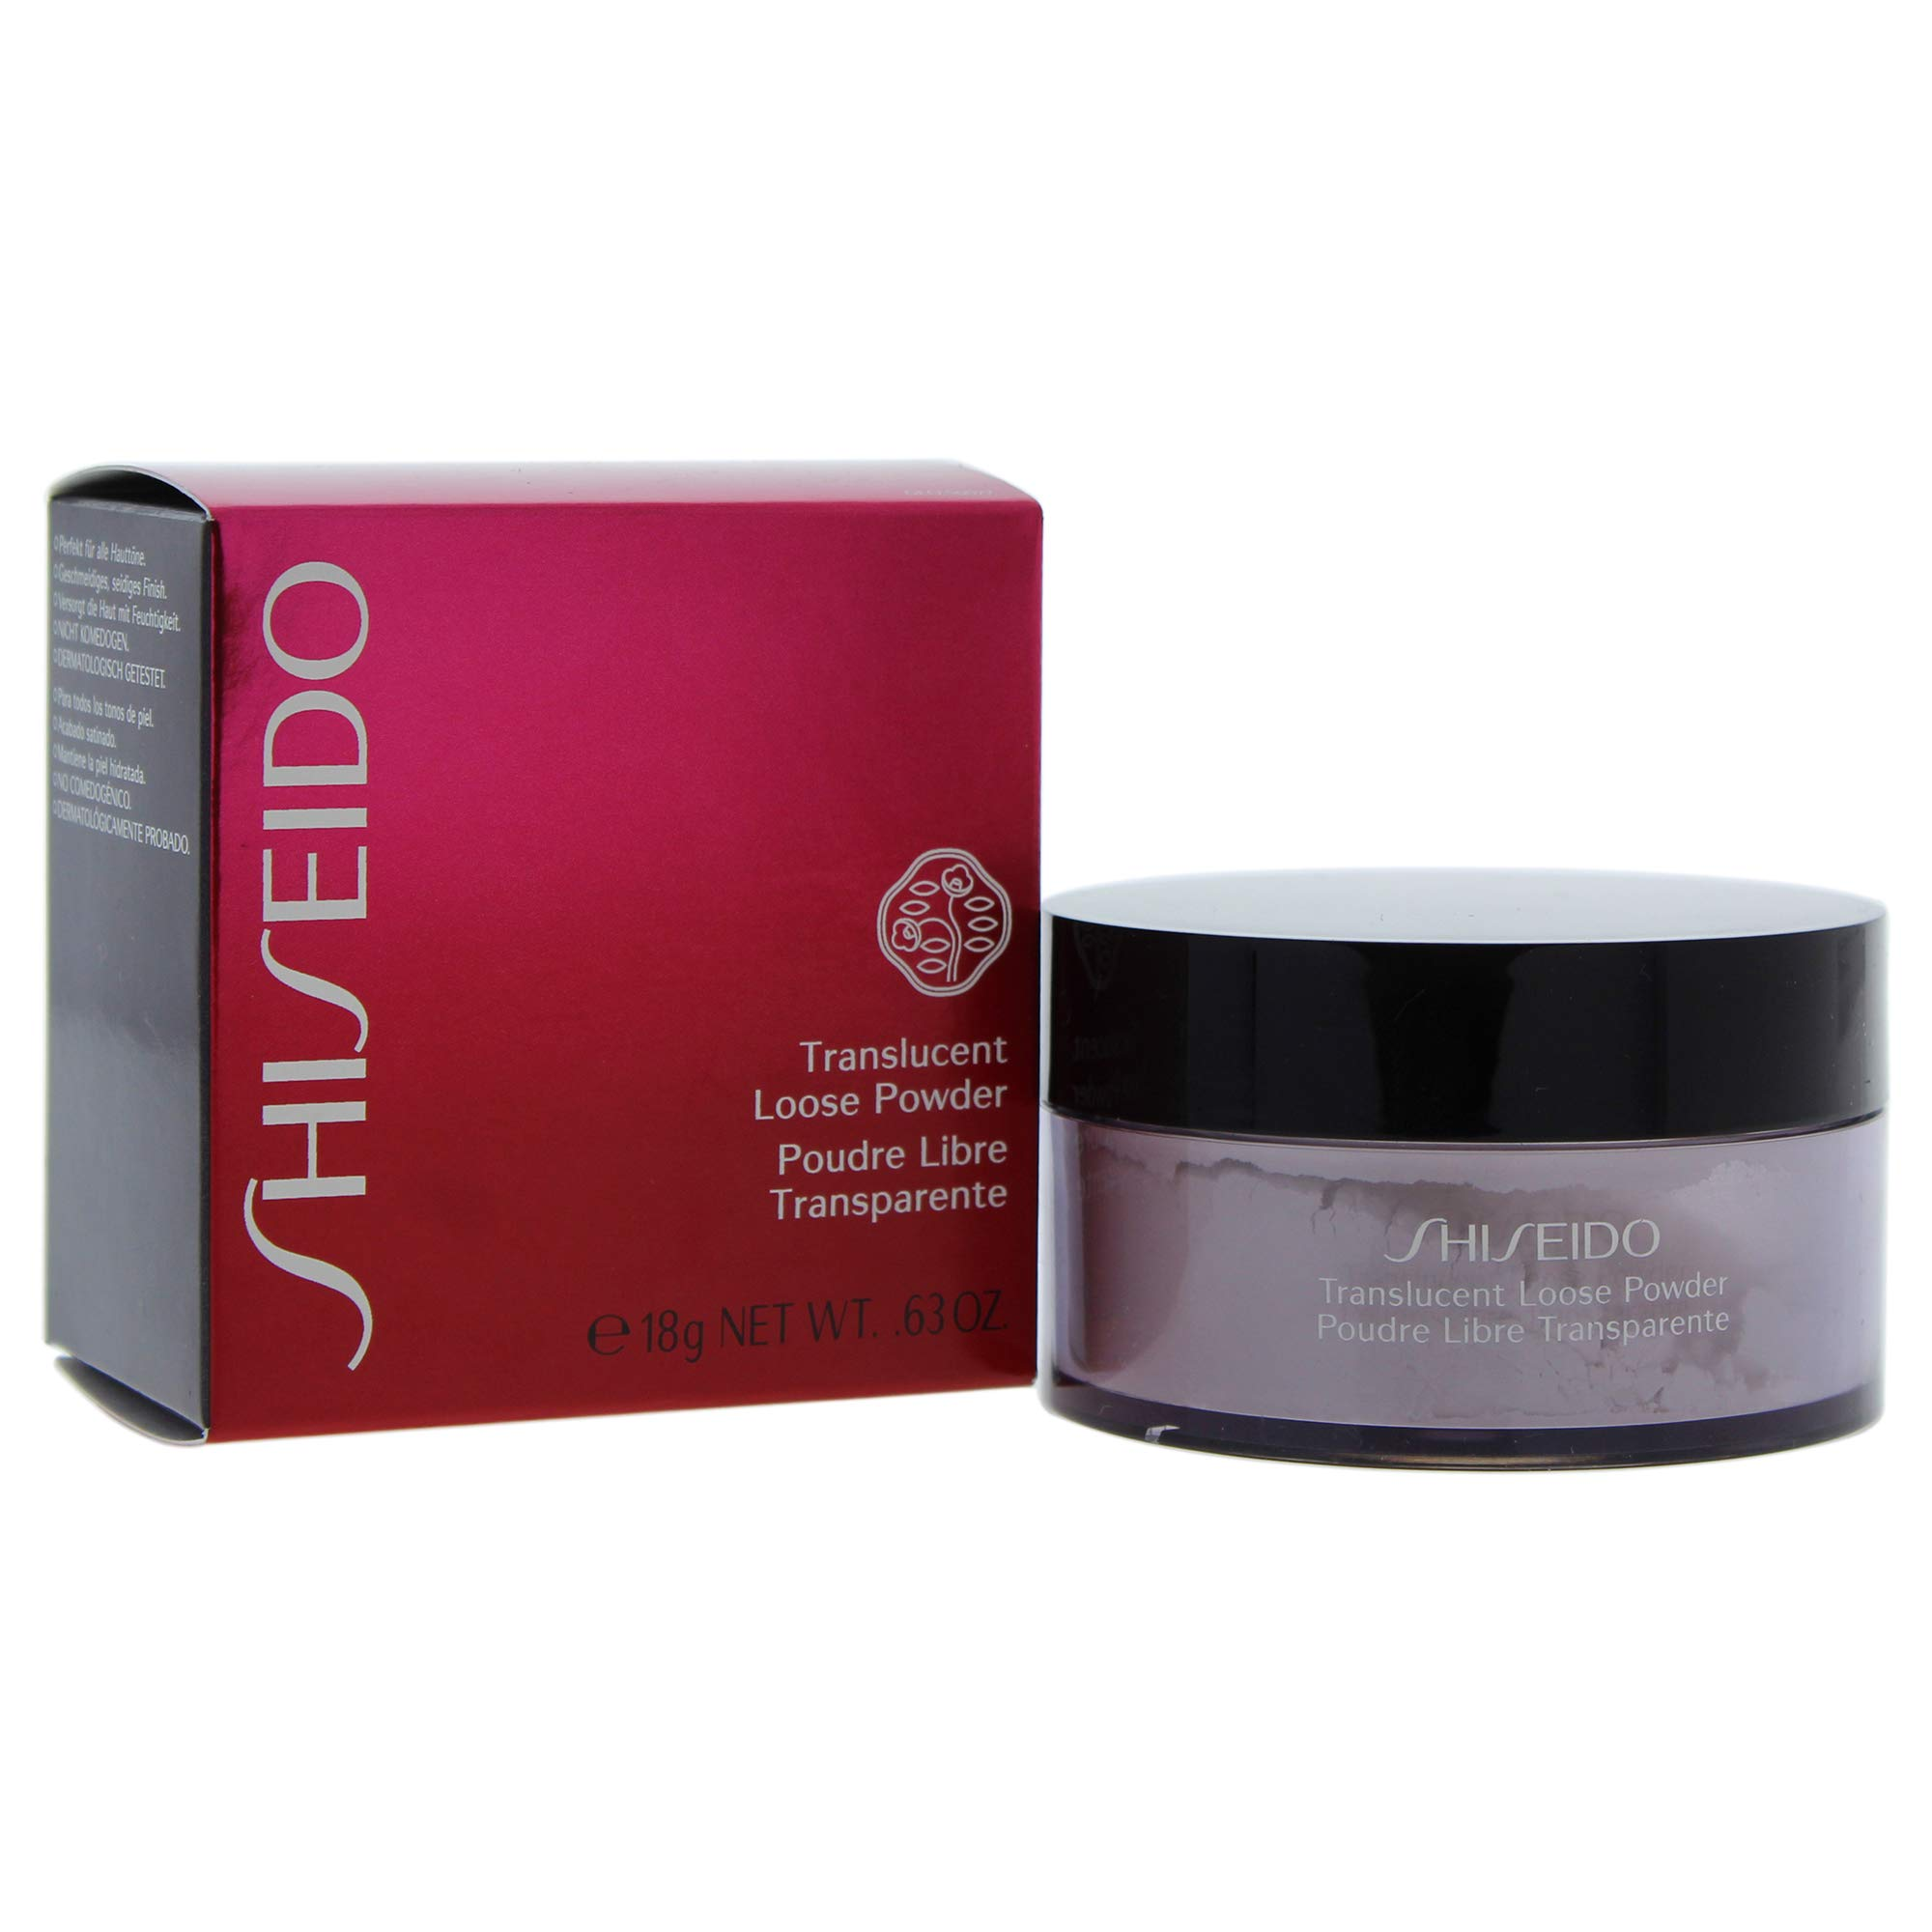 Shiseido Translucent Loose Powder By Shiseido for Women - 0.63 Oz Powder, 0.63 Oz by Shiseido